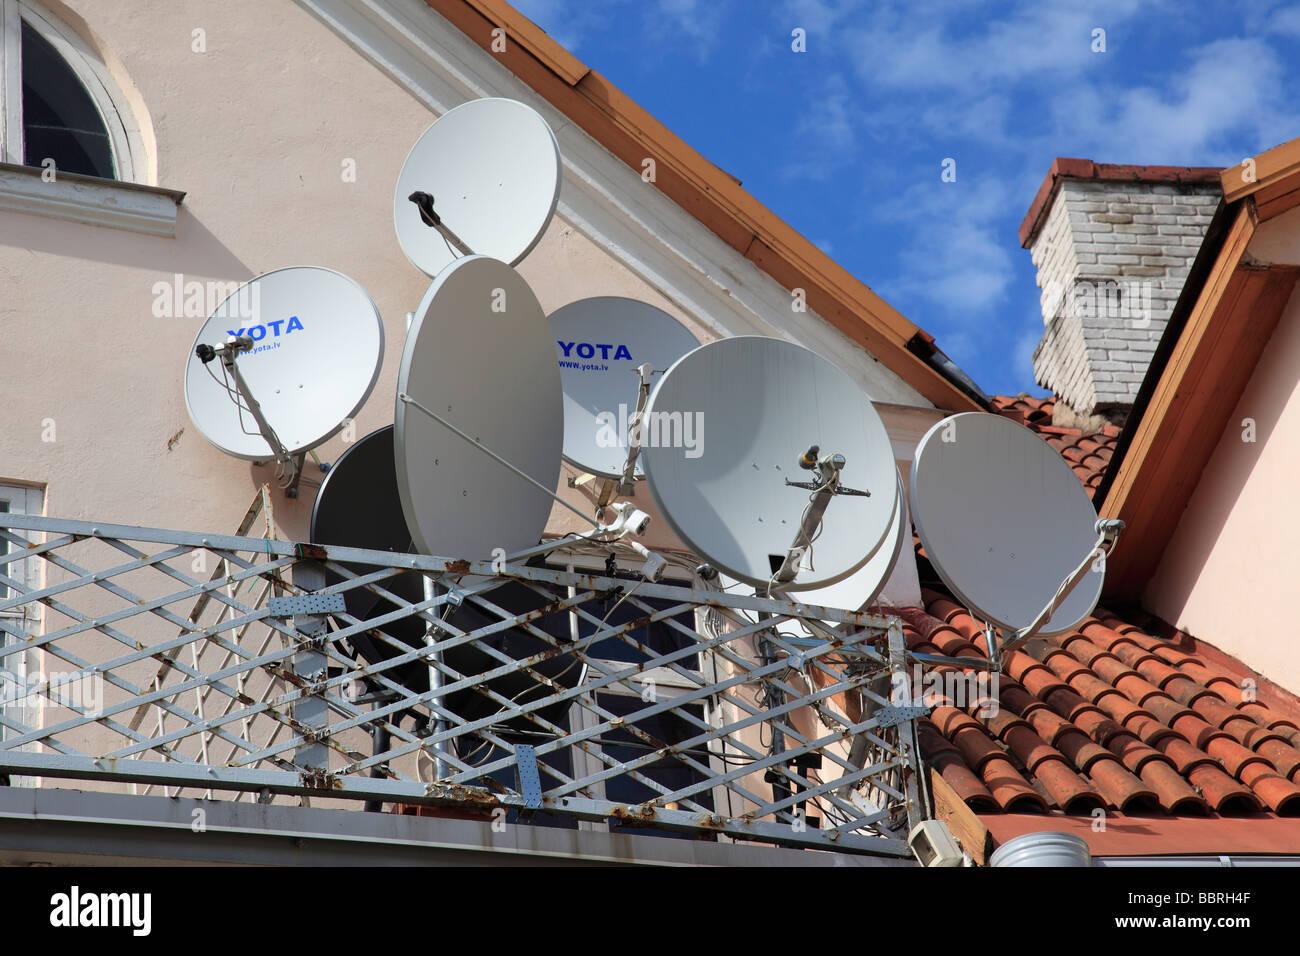 many parabol antennas Tartu, Estonia, Baltic State, Eastern Europe. Photo by Willy Matheisl - Stock Image